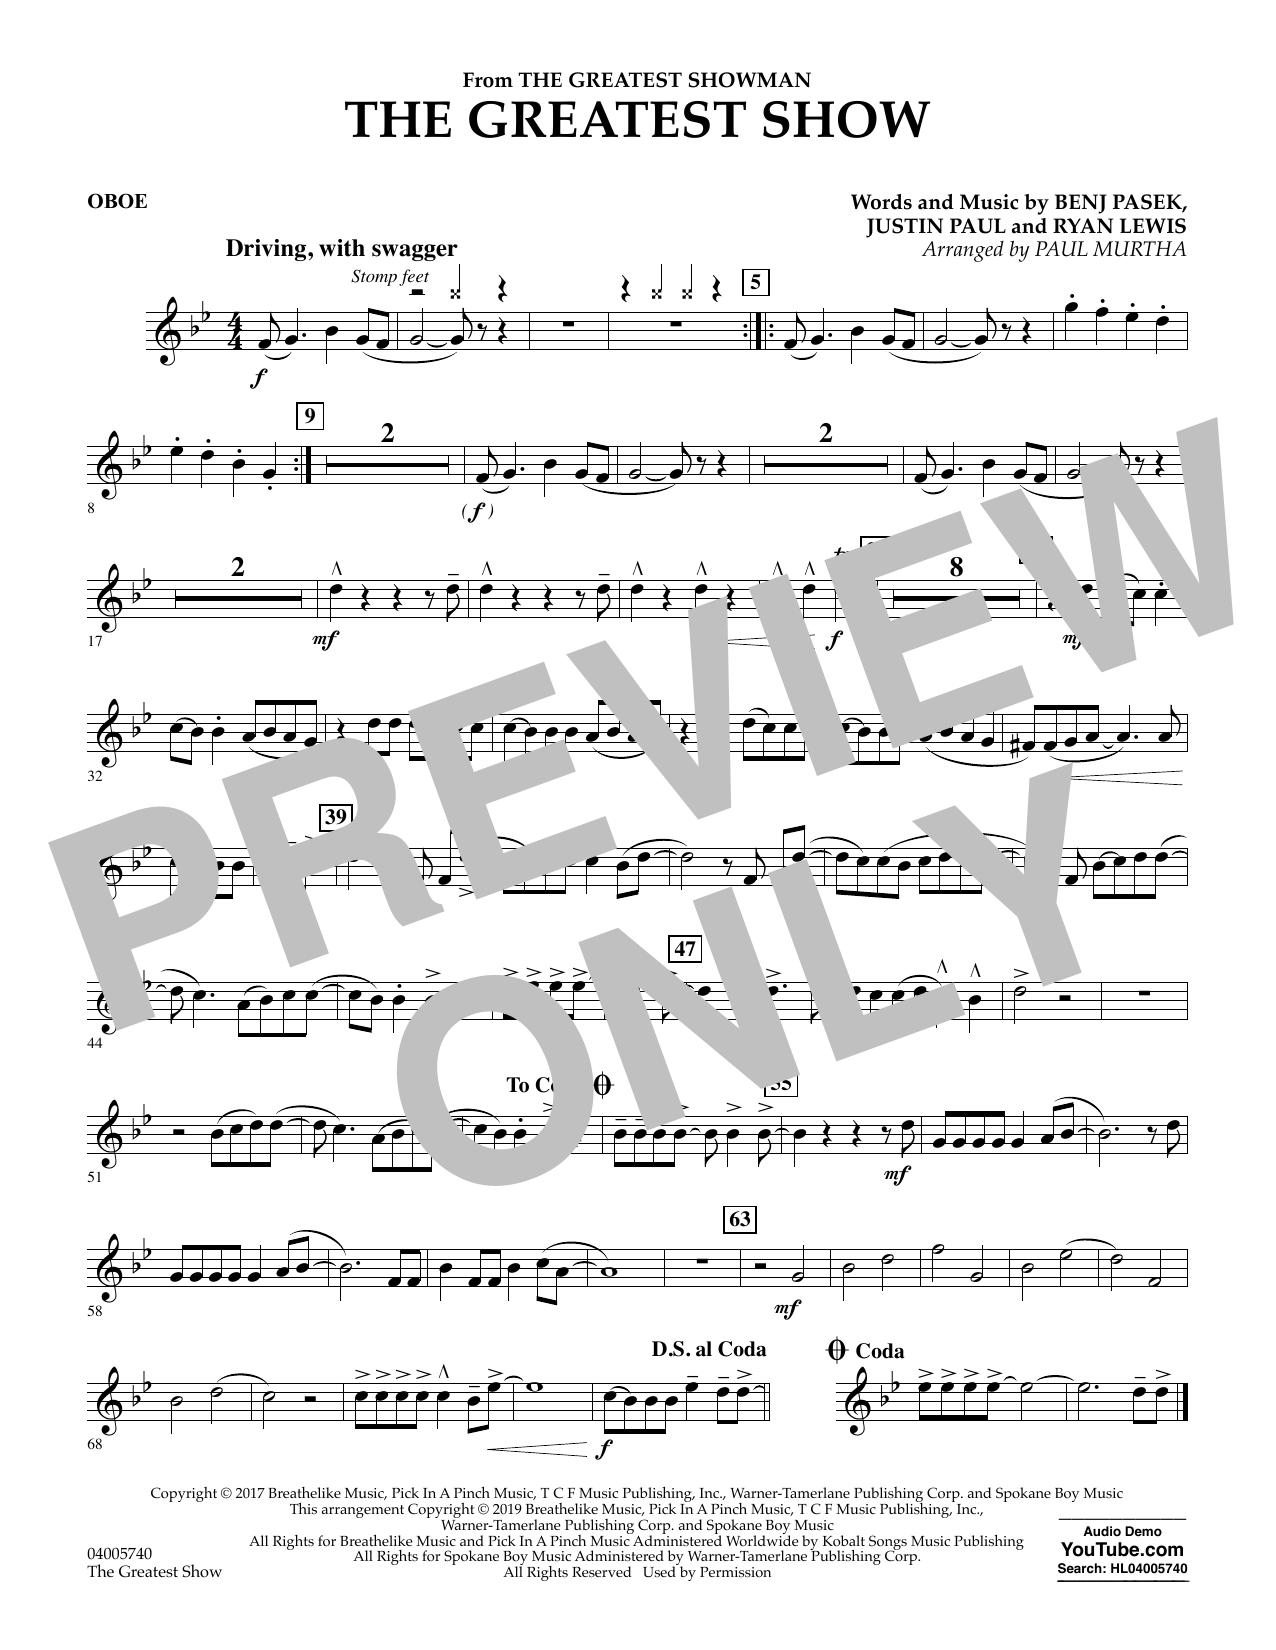 The Greatest Show  (arr. Paul Murtha) - Oboe (Concert Band)